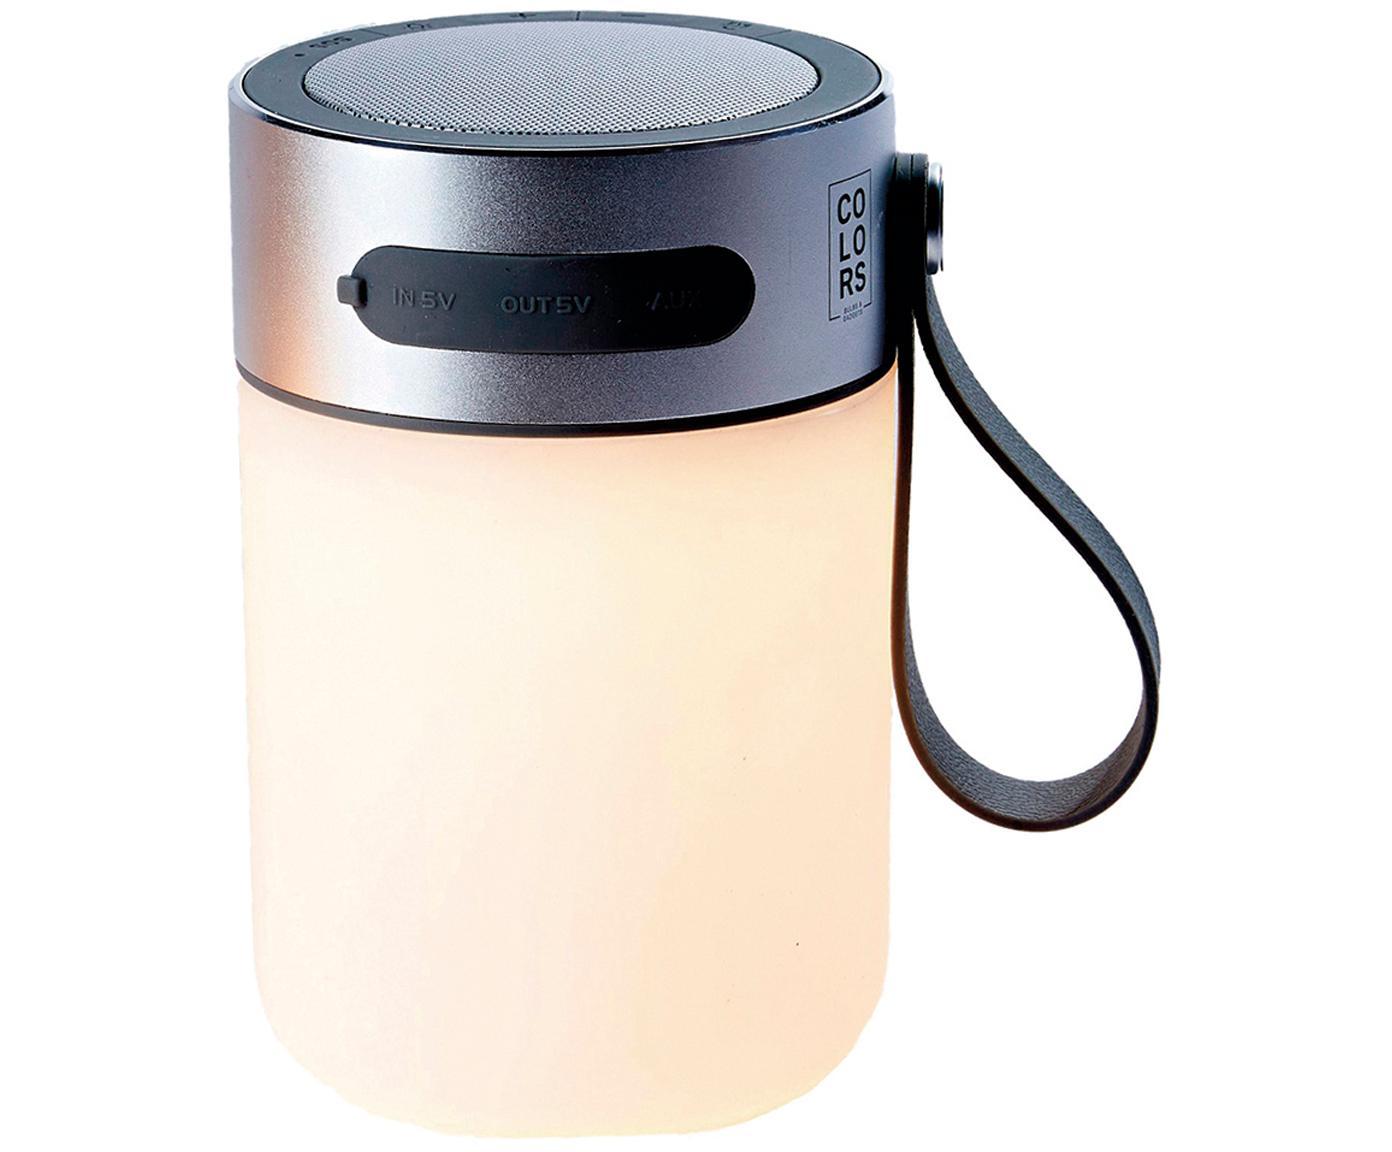 Lampada da esterno a LED portatile Sound Jar, Quadrante: metallo, Paralume: materiale sintetico, Argento, bianco, Ø 9 x Alt. 14 cm